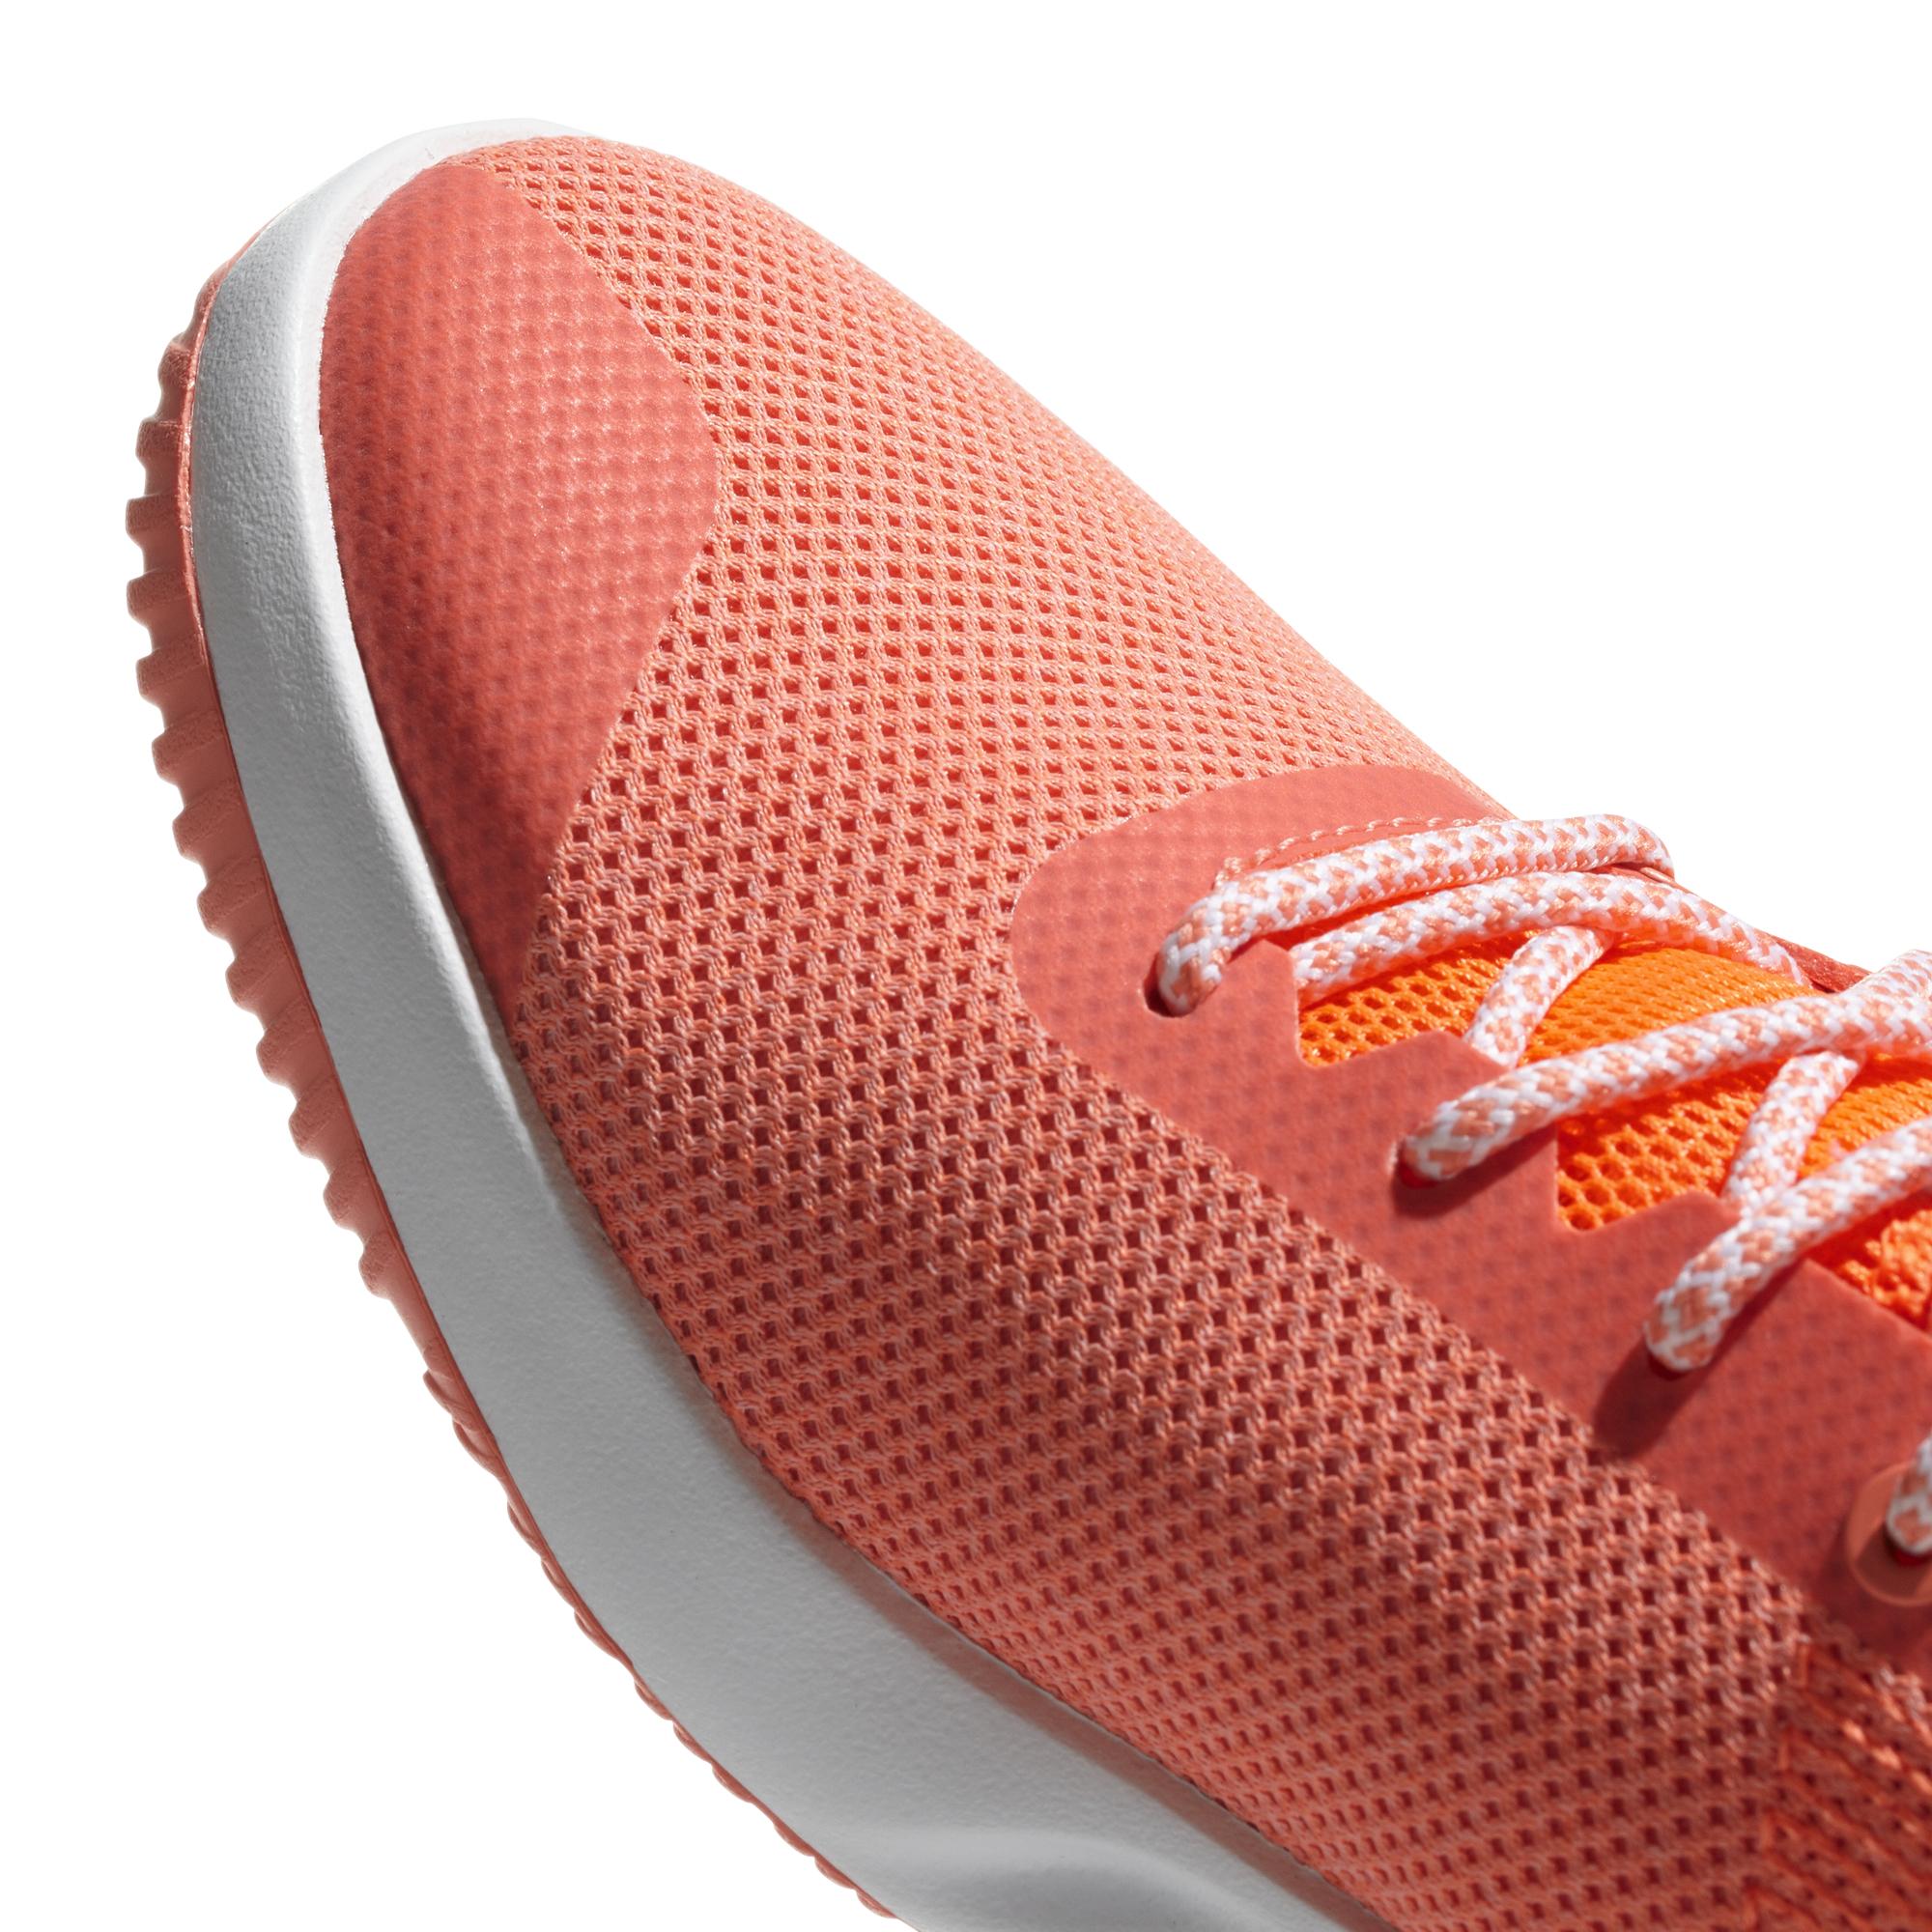 489107484 buty treningowe adidas CrazyTrain LT CG3499 || timsport.pl - darmowa ...